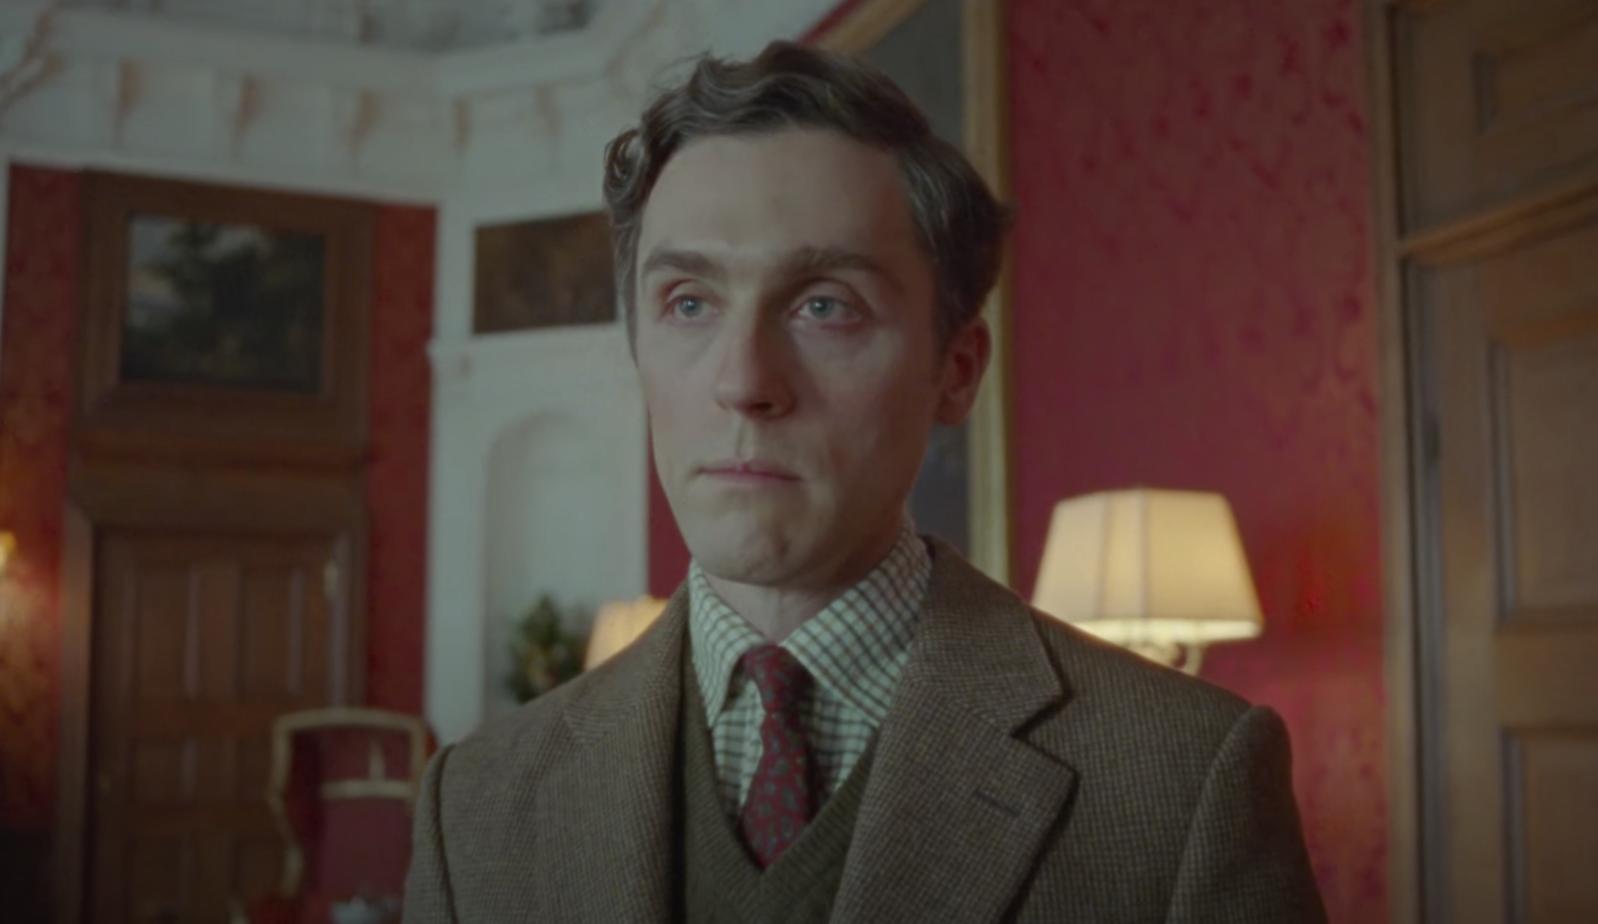 Jack as Charles in a dark suit and tie